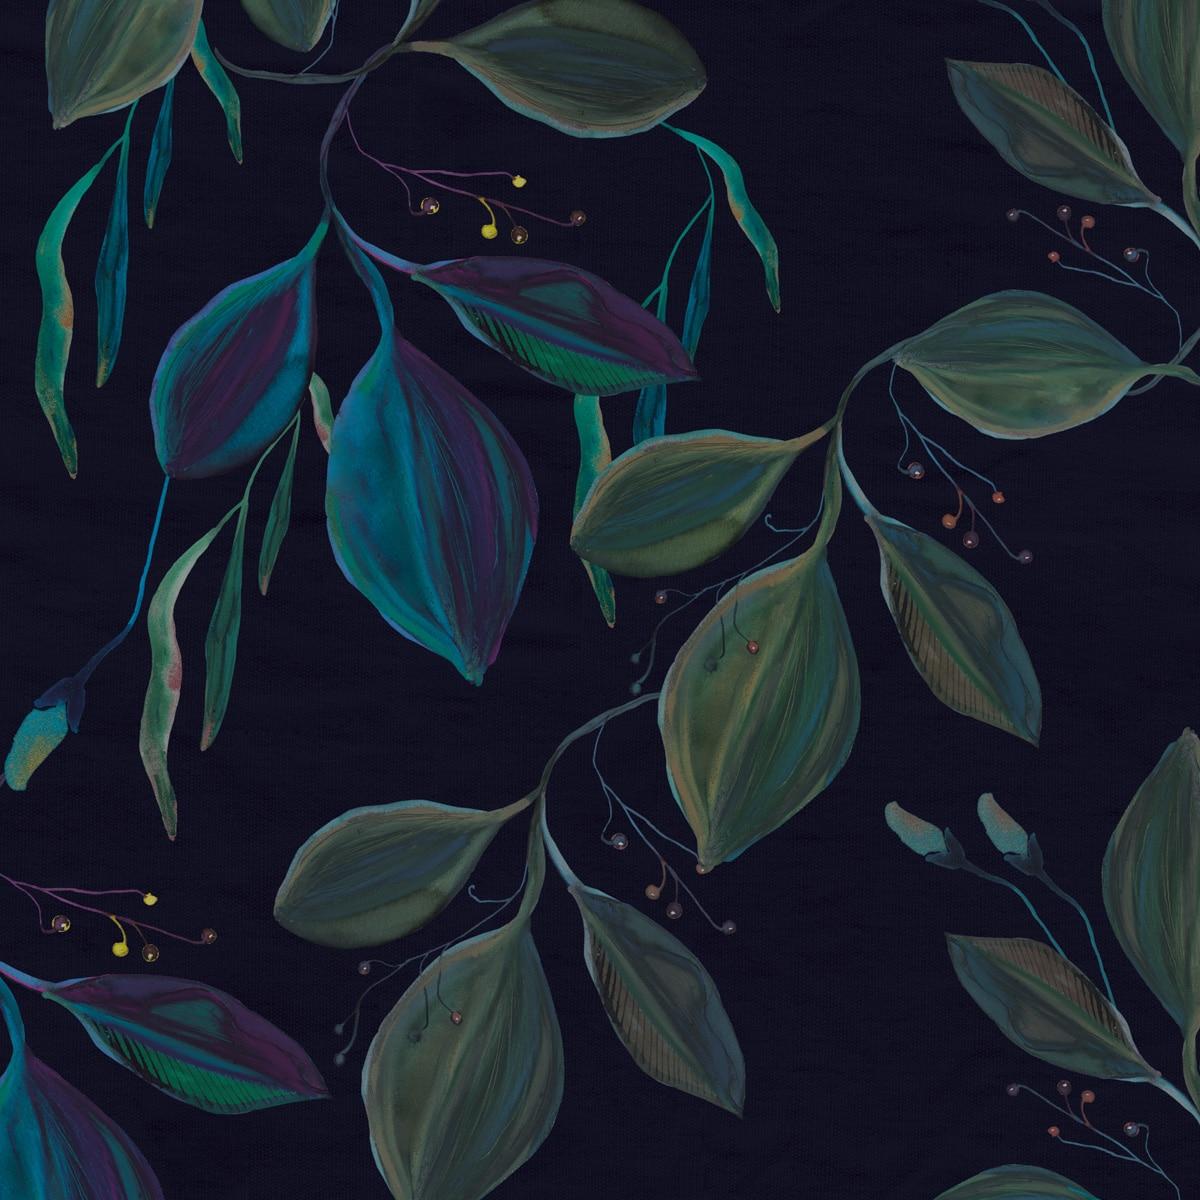 marta cortese_textile designer_terratinta_sartoria_01_detail